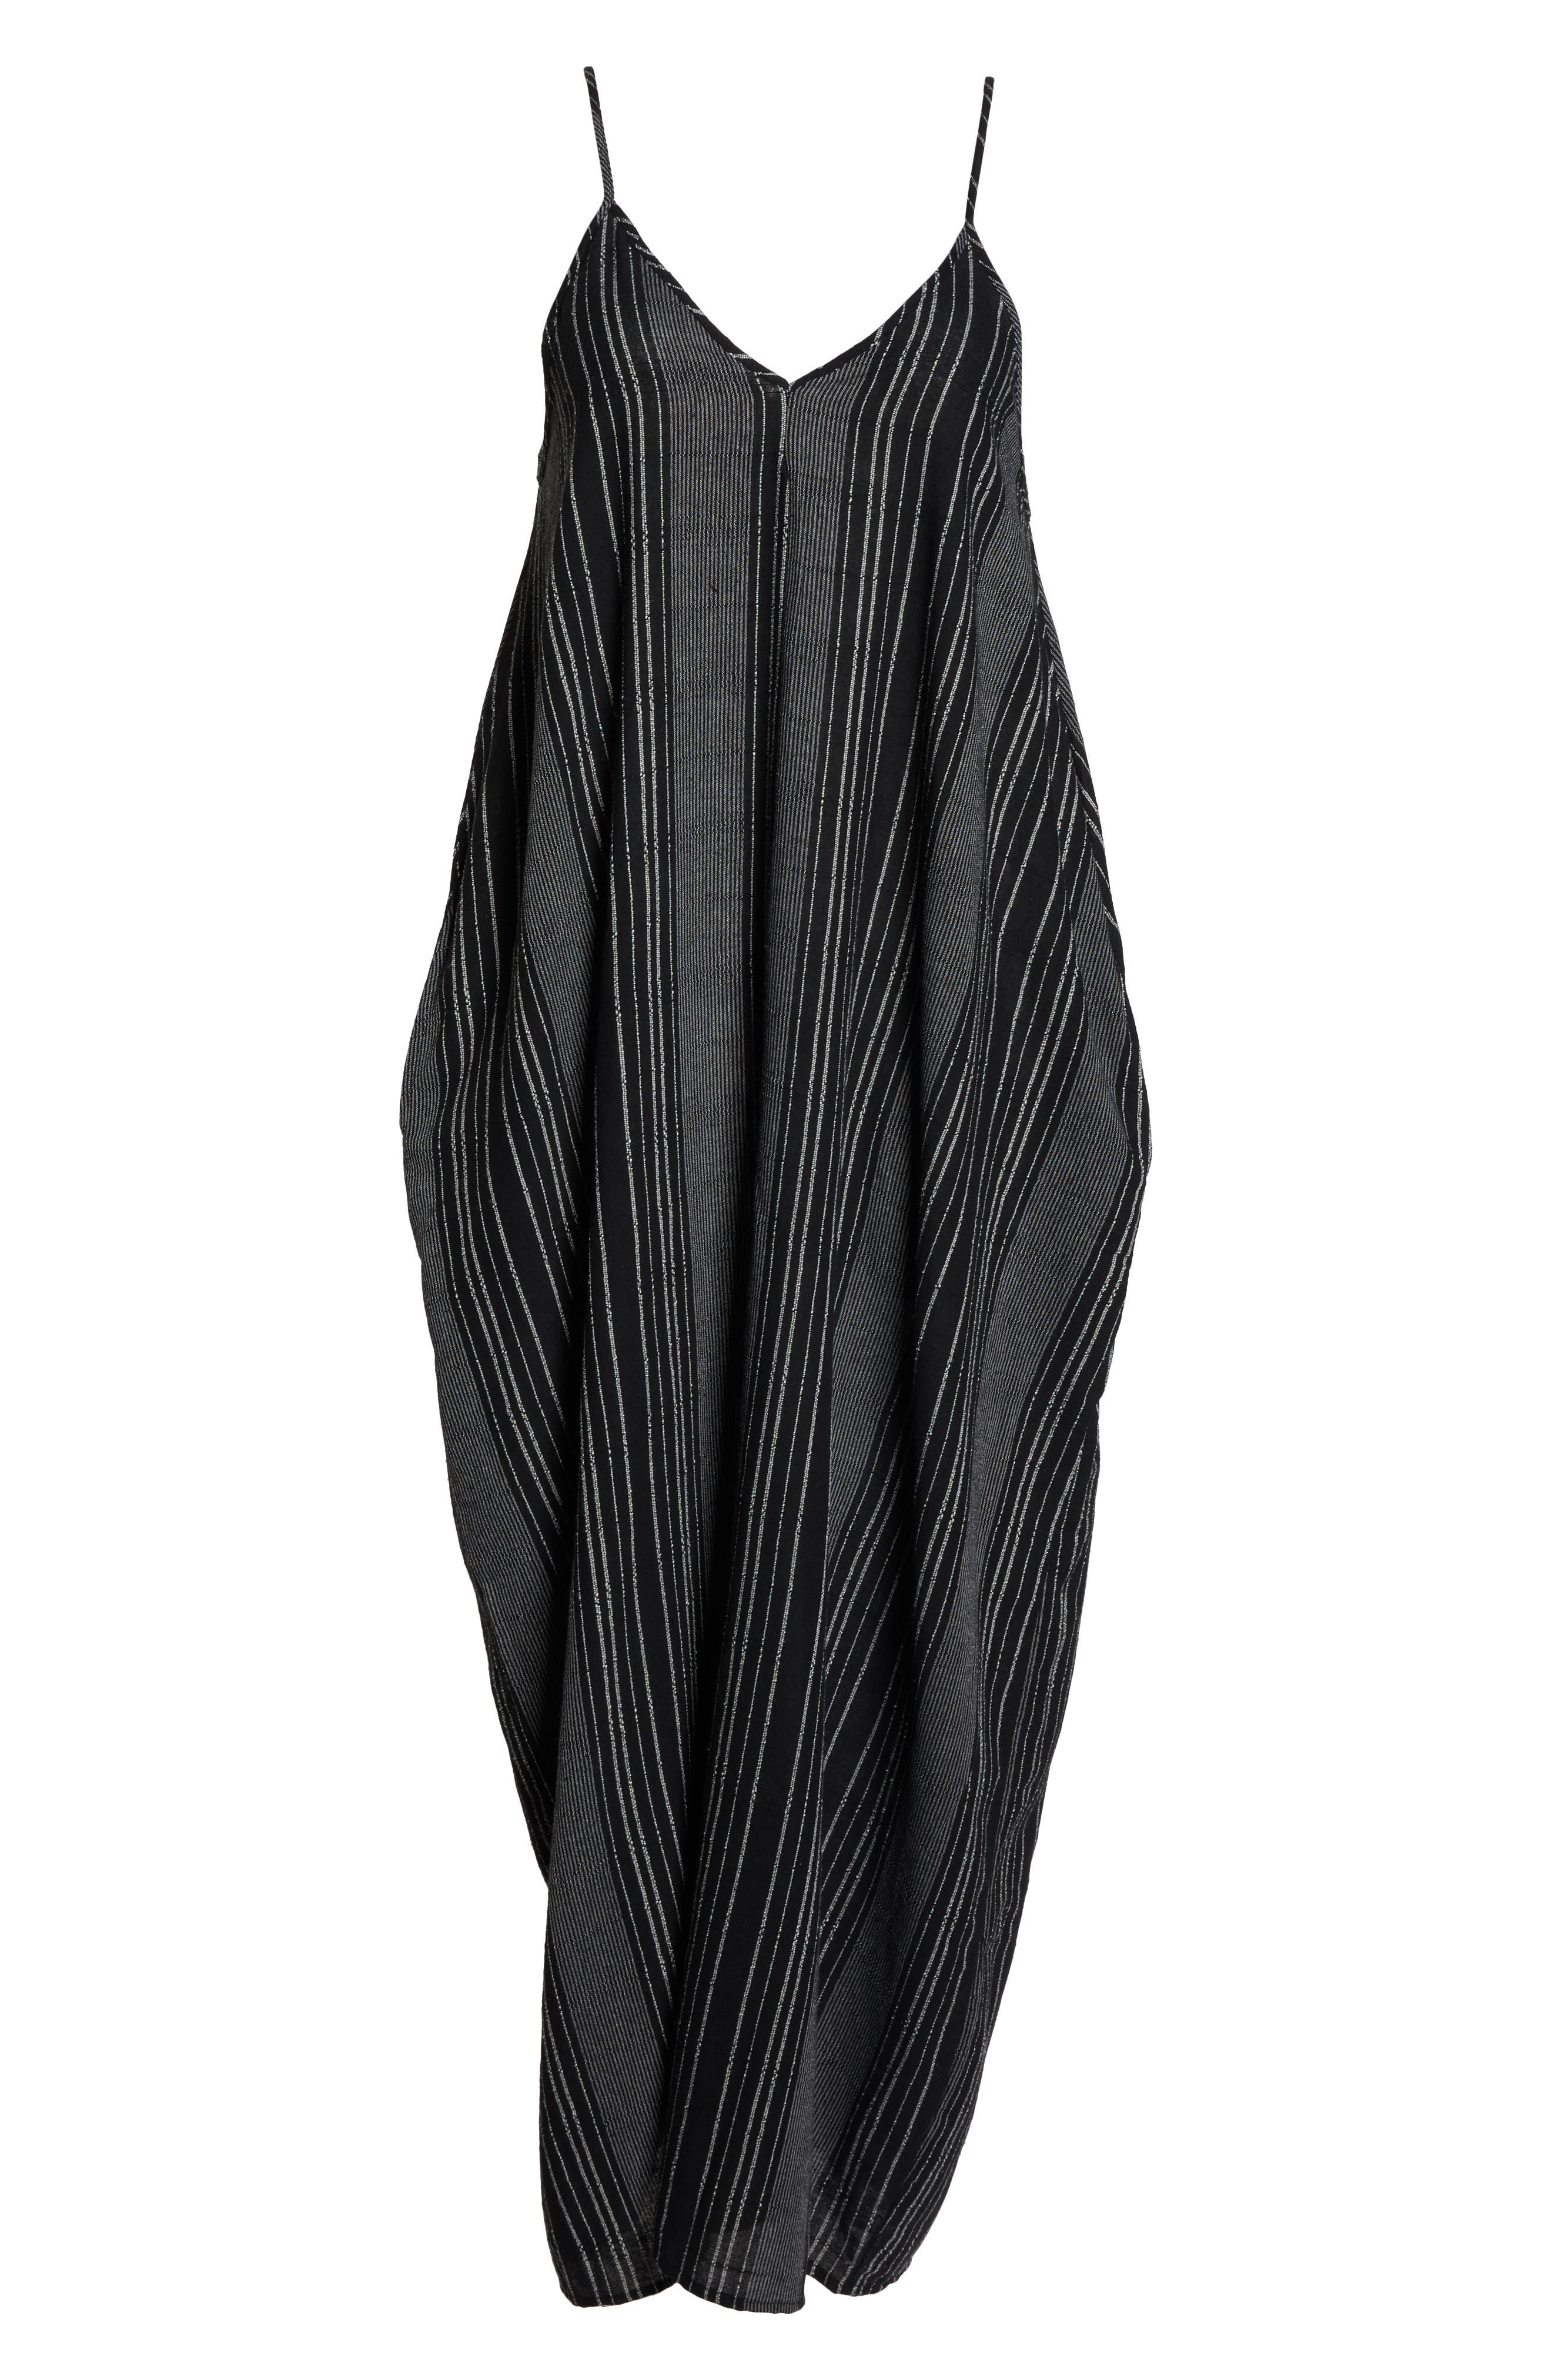 Cover-Up Maxi Dress,                             Alternate thumbnail 6, color,                             BLACK/ WHITE STRIPE